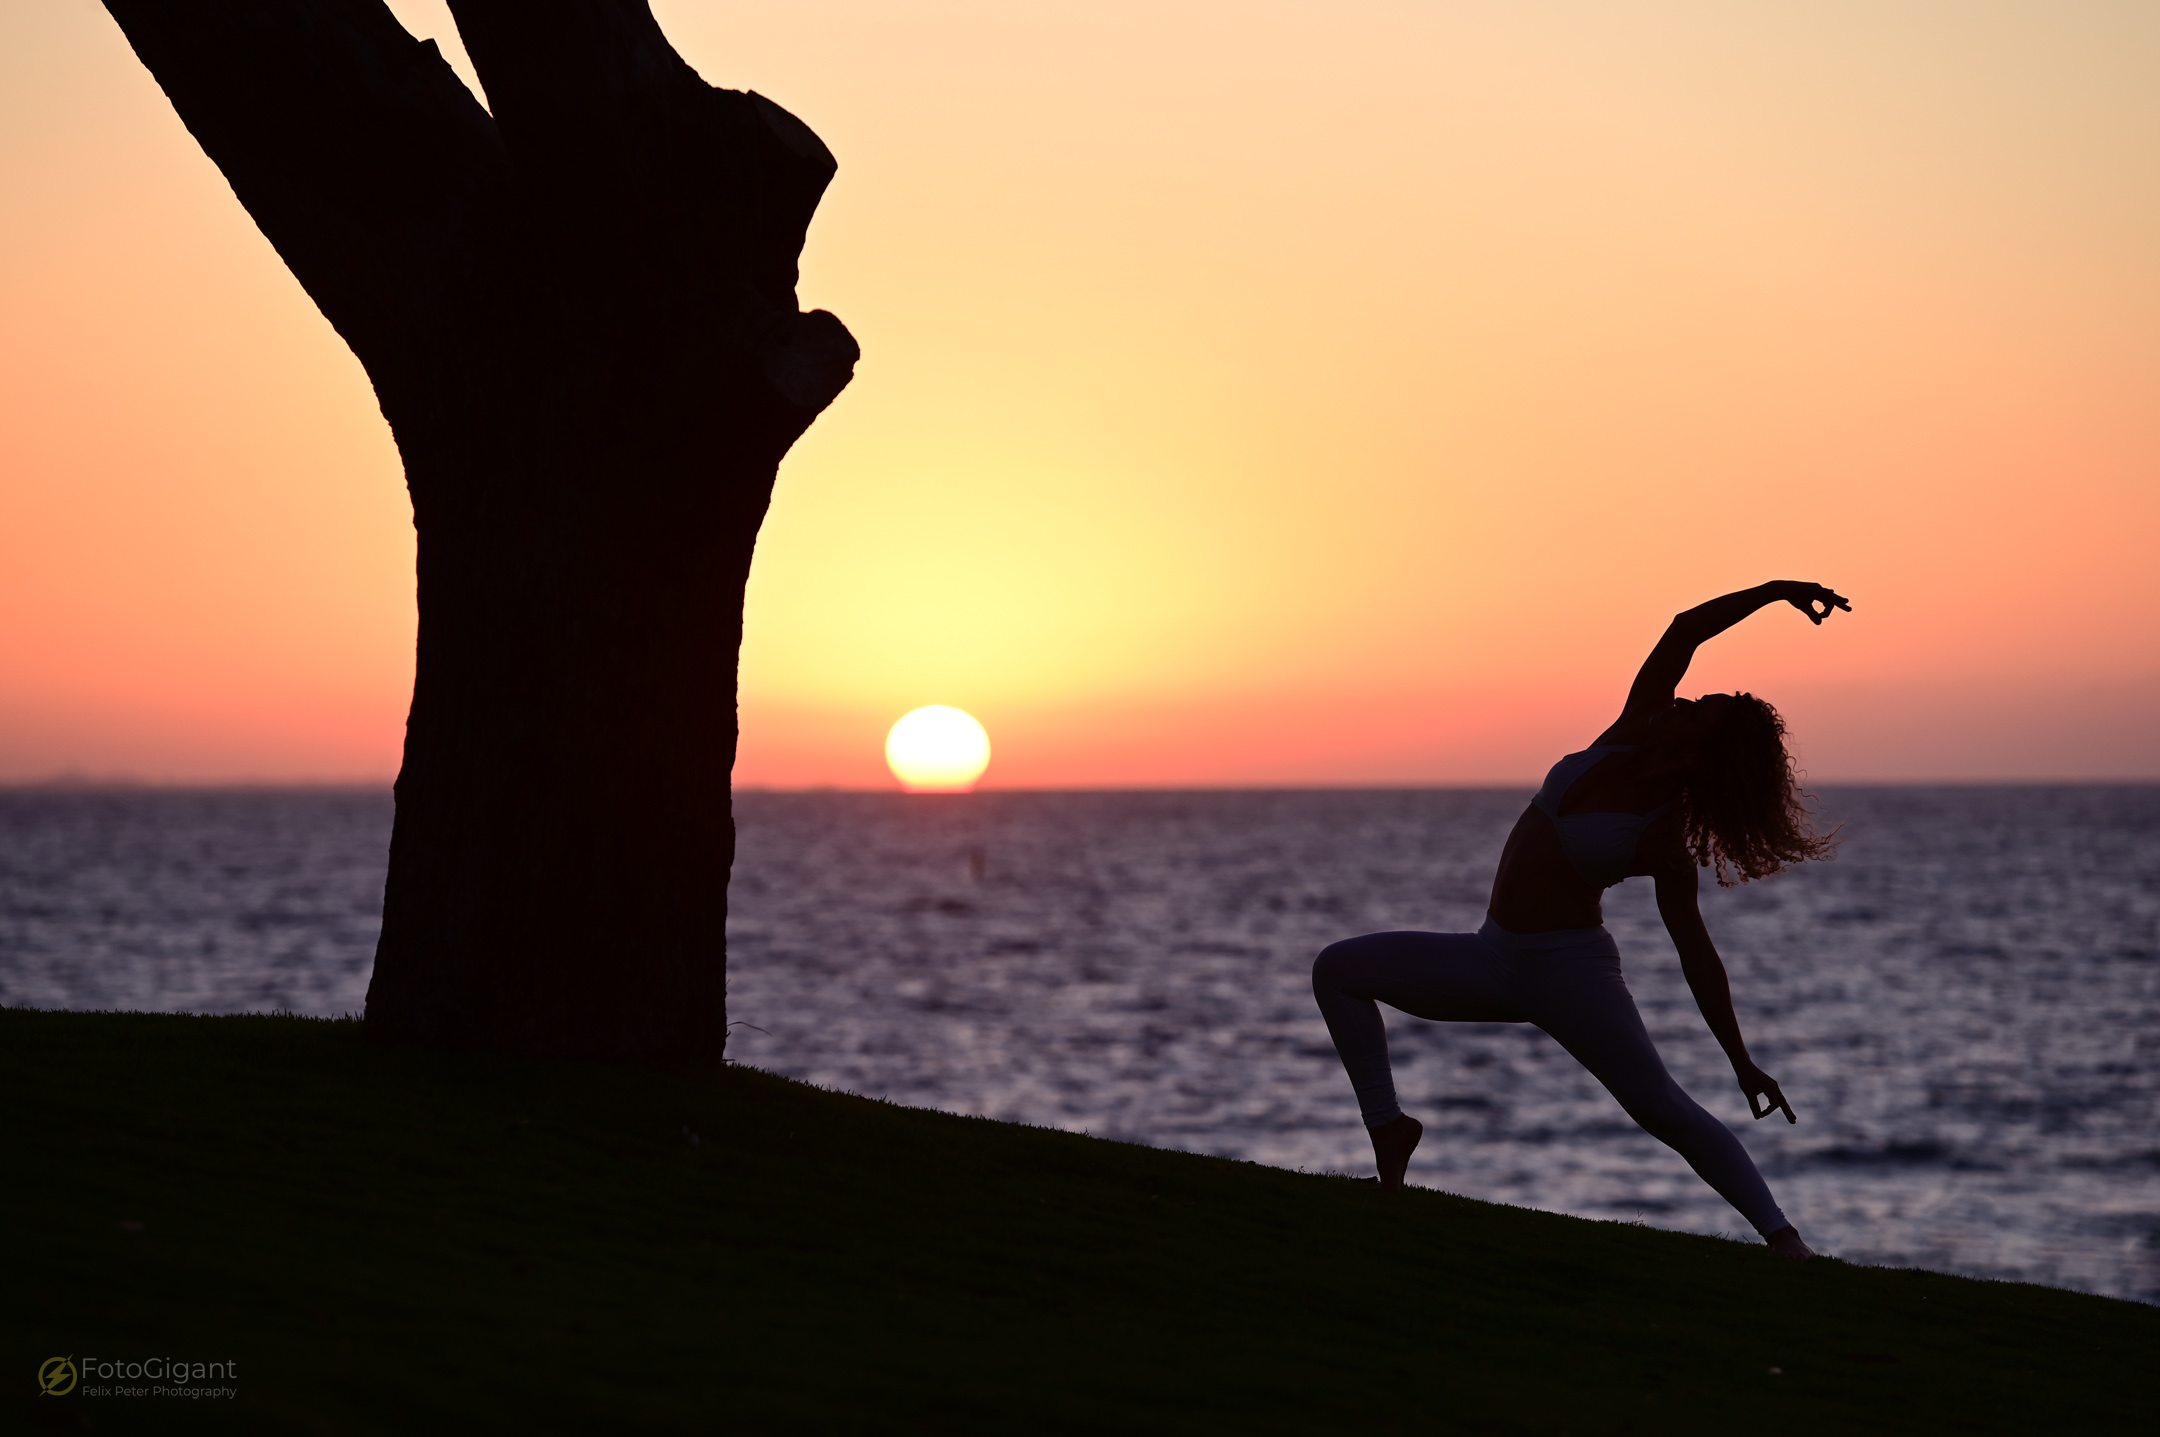 Pilates_Yoga_Silhouettes_12.jpg